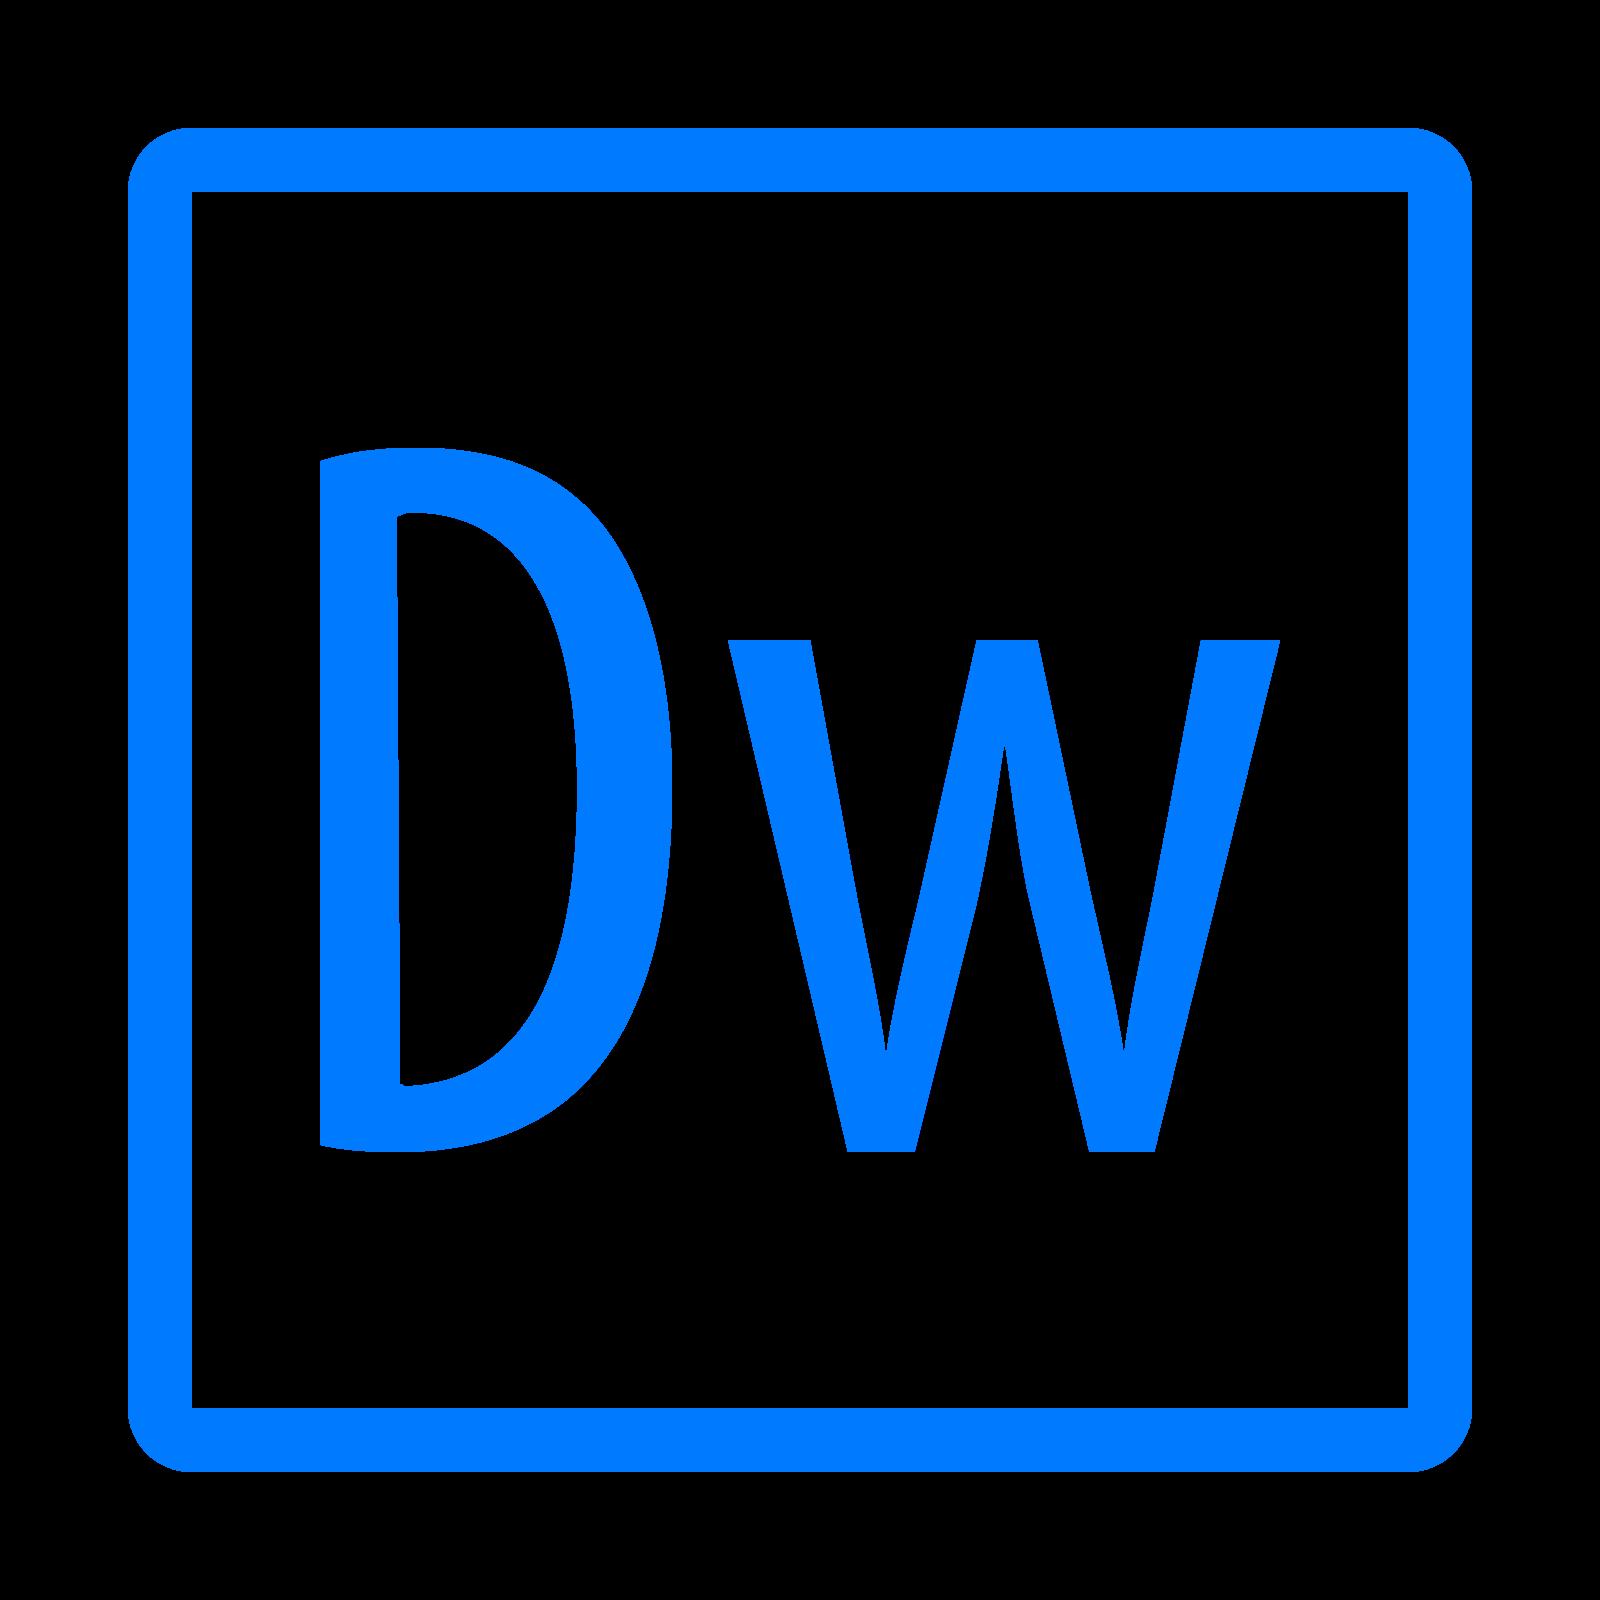 Adobe Dreamweaver Icon.